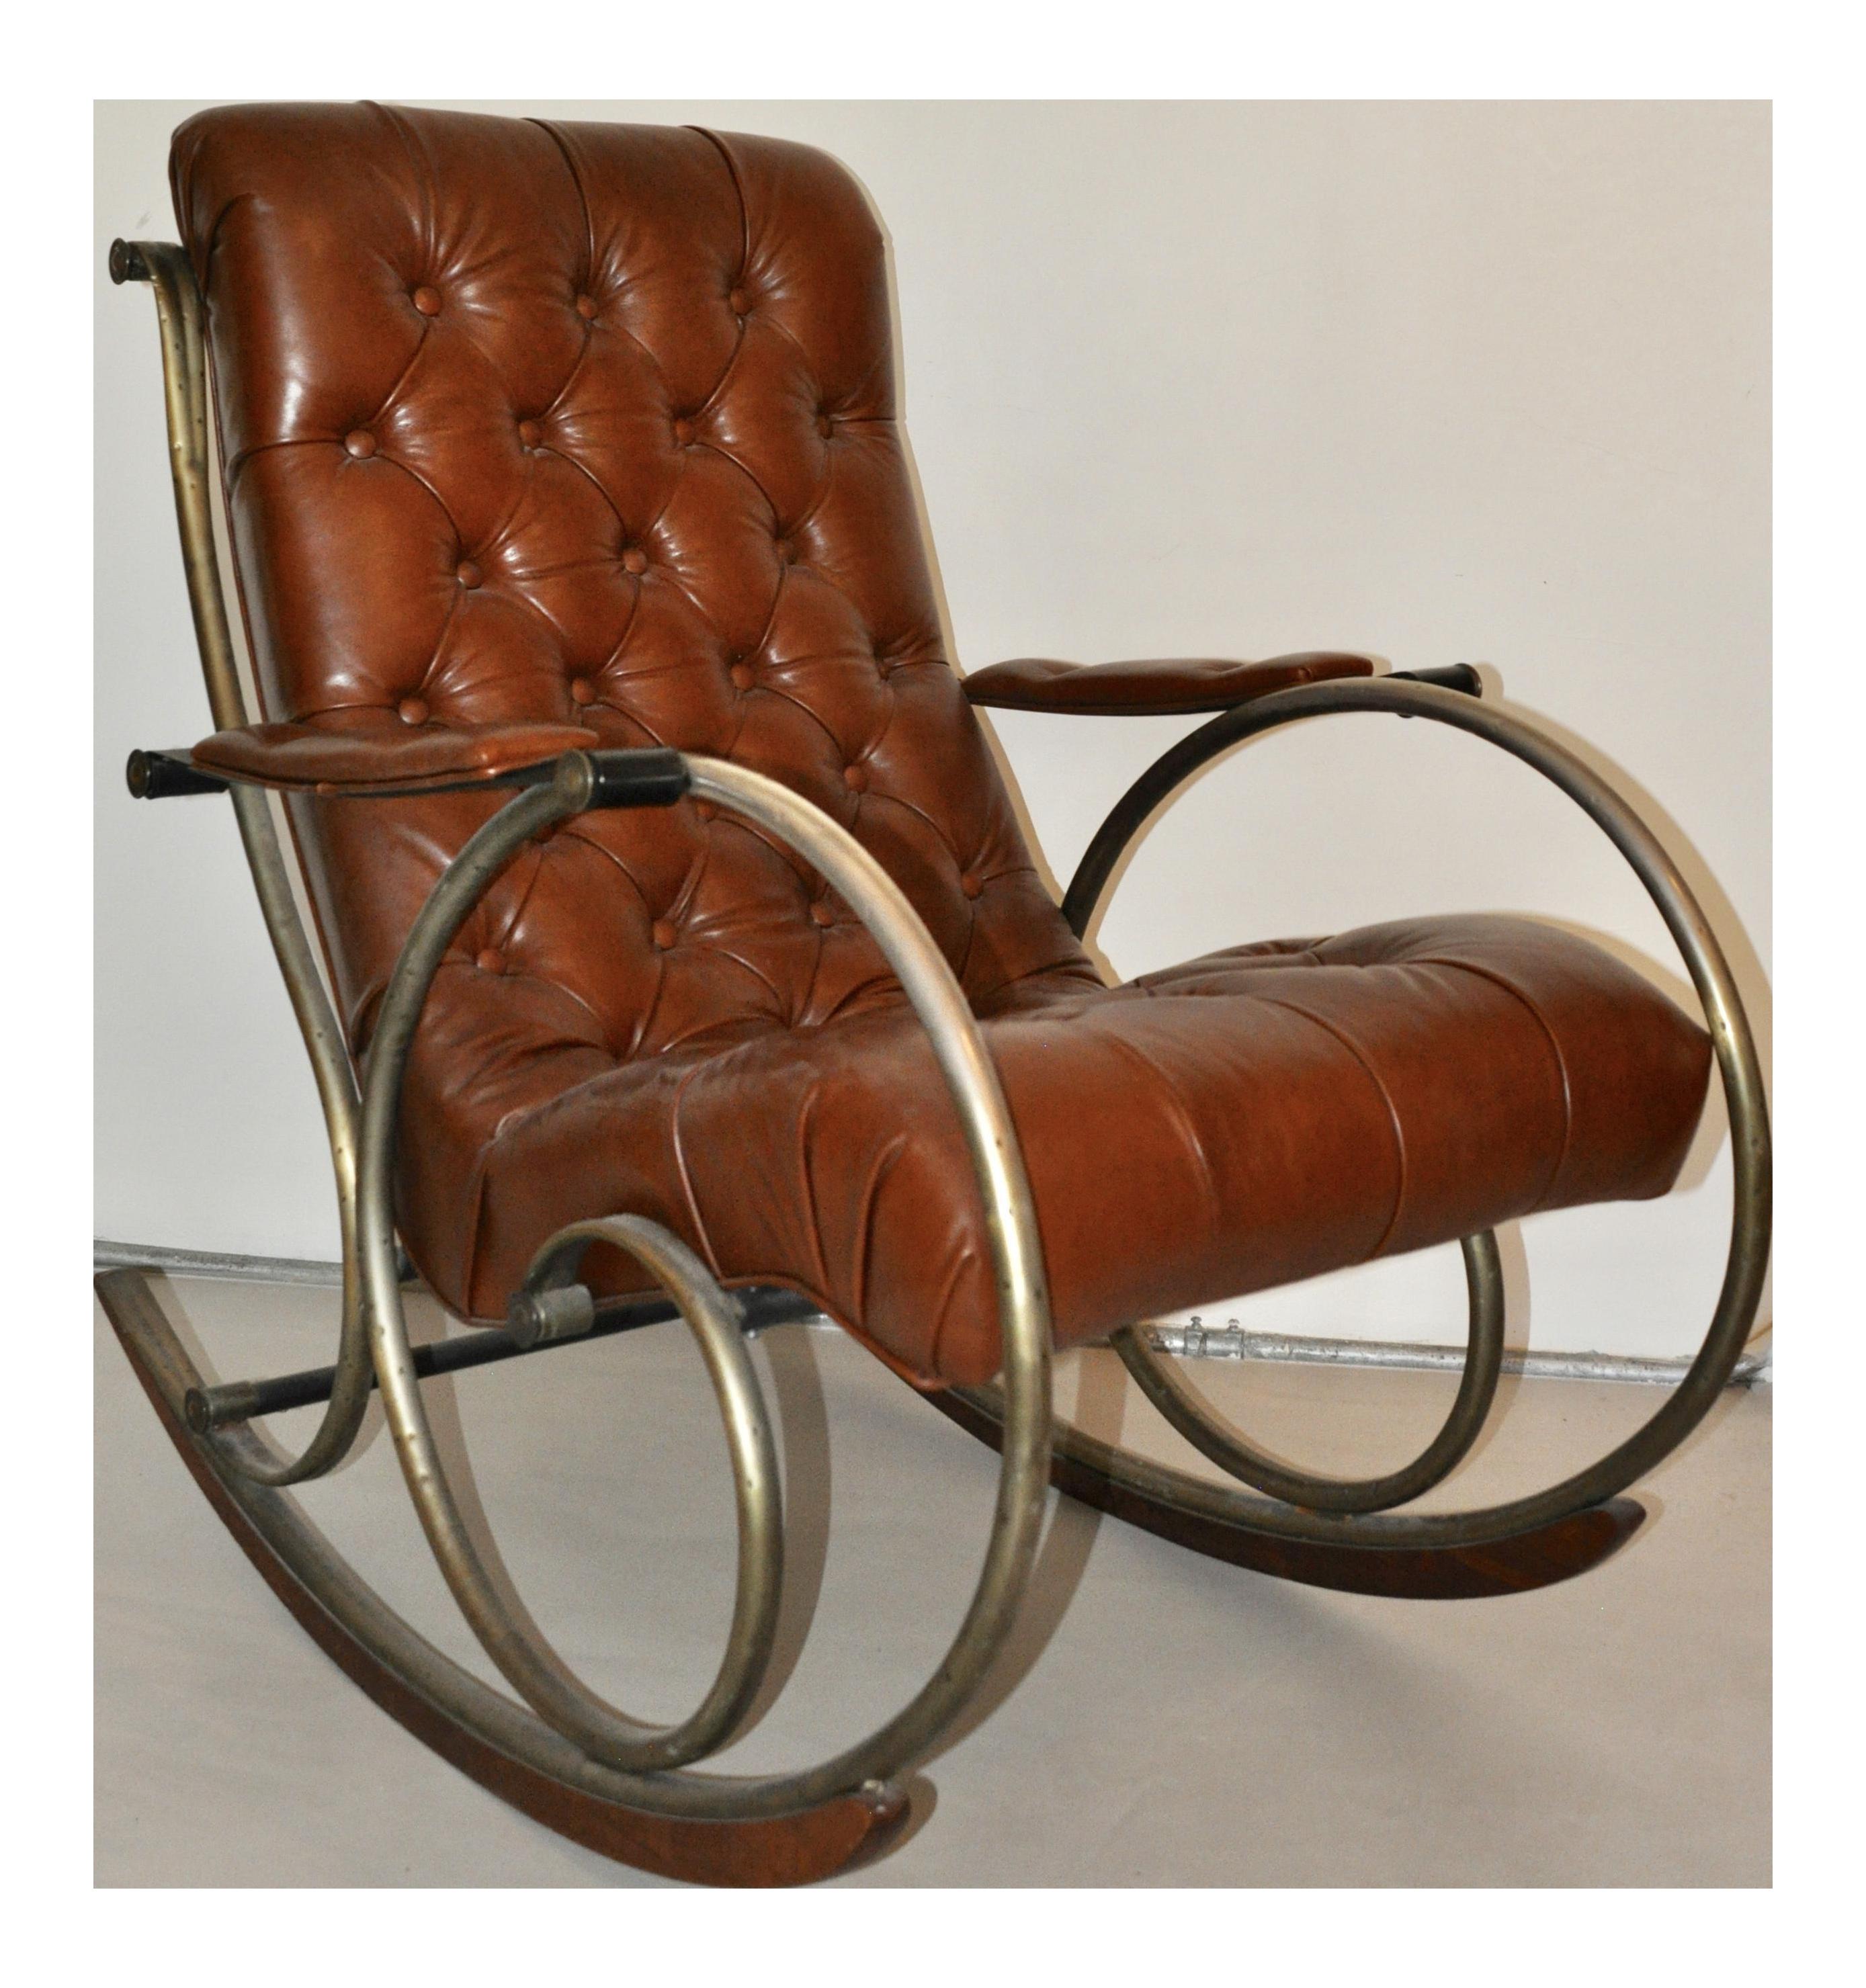 Antique Brass Steel Amp Leather Rocking Chair Chairish